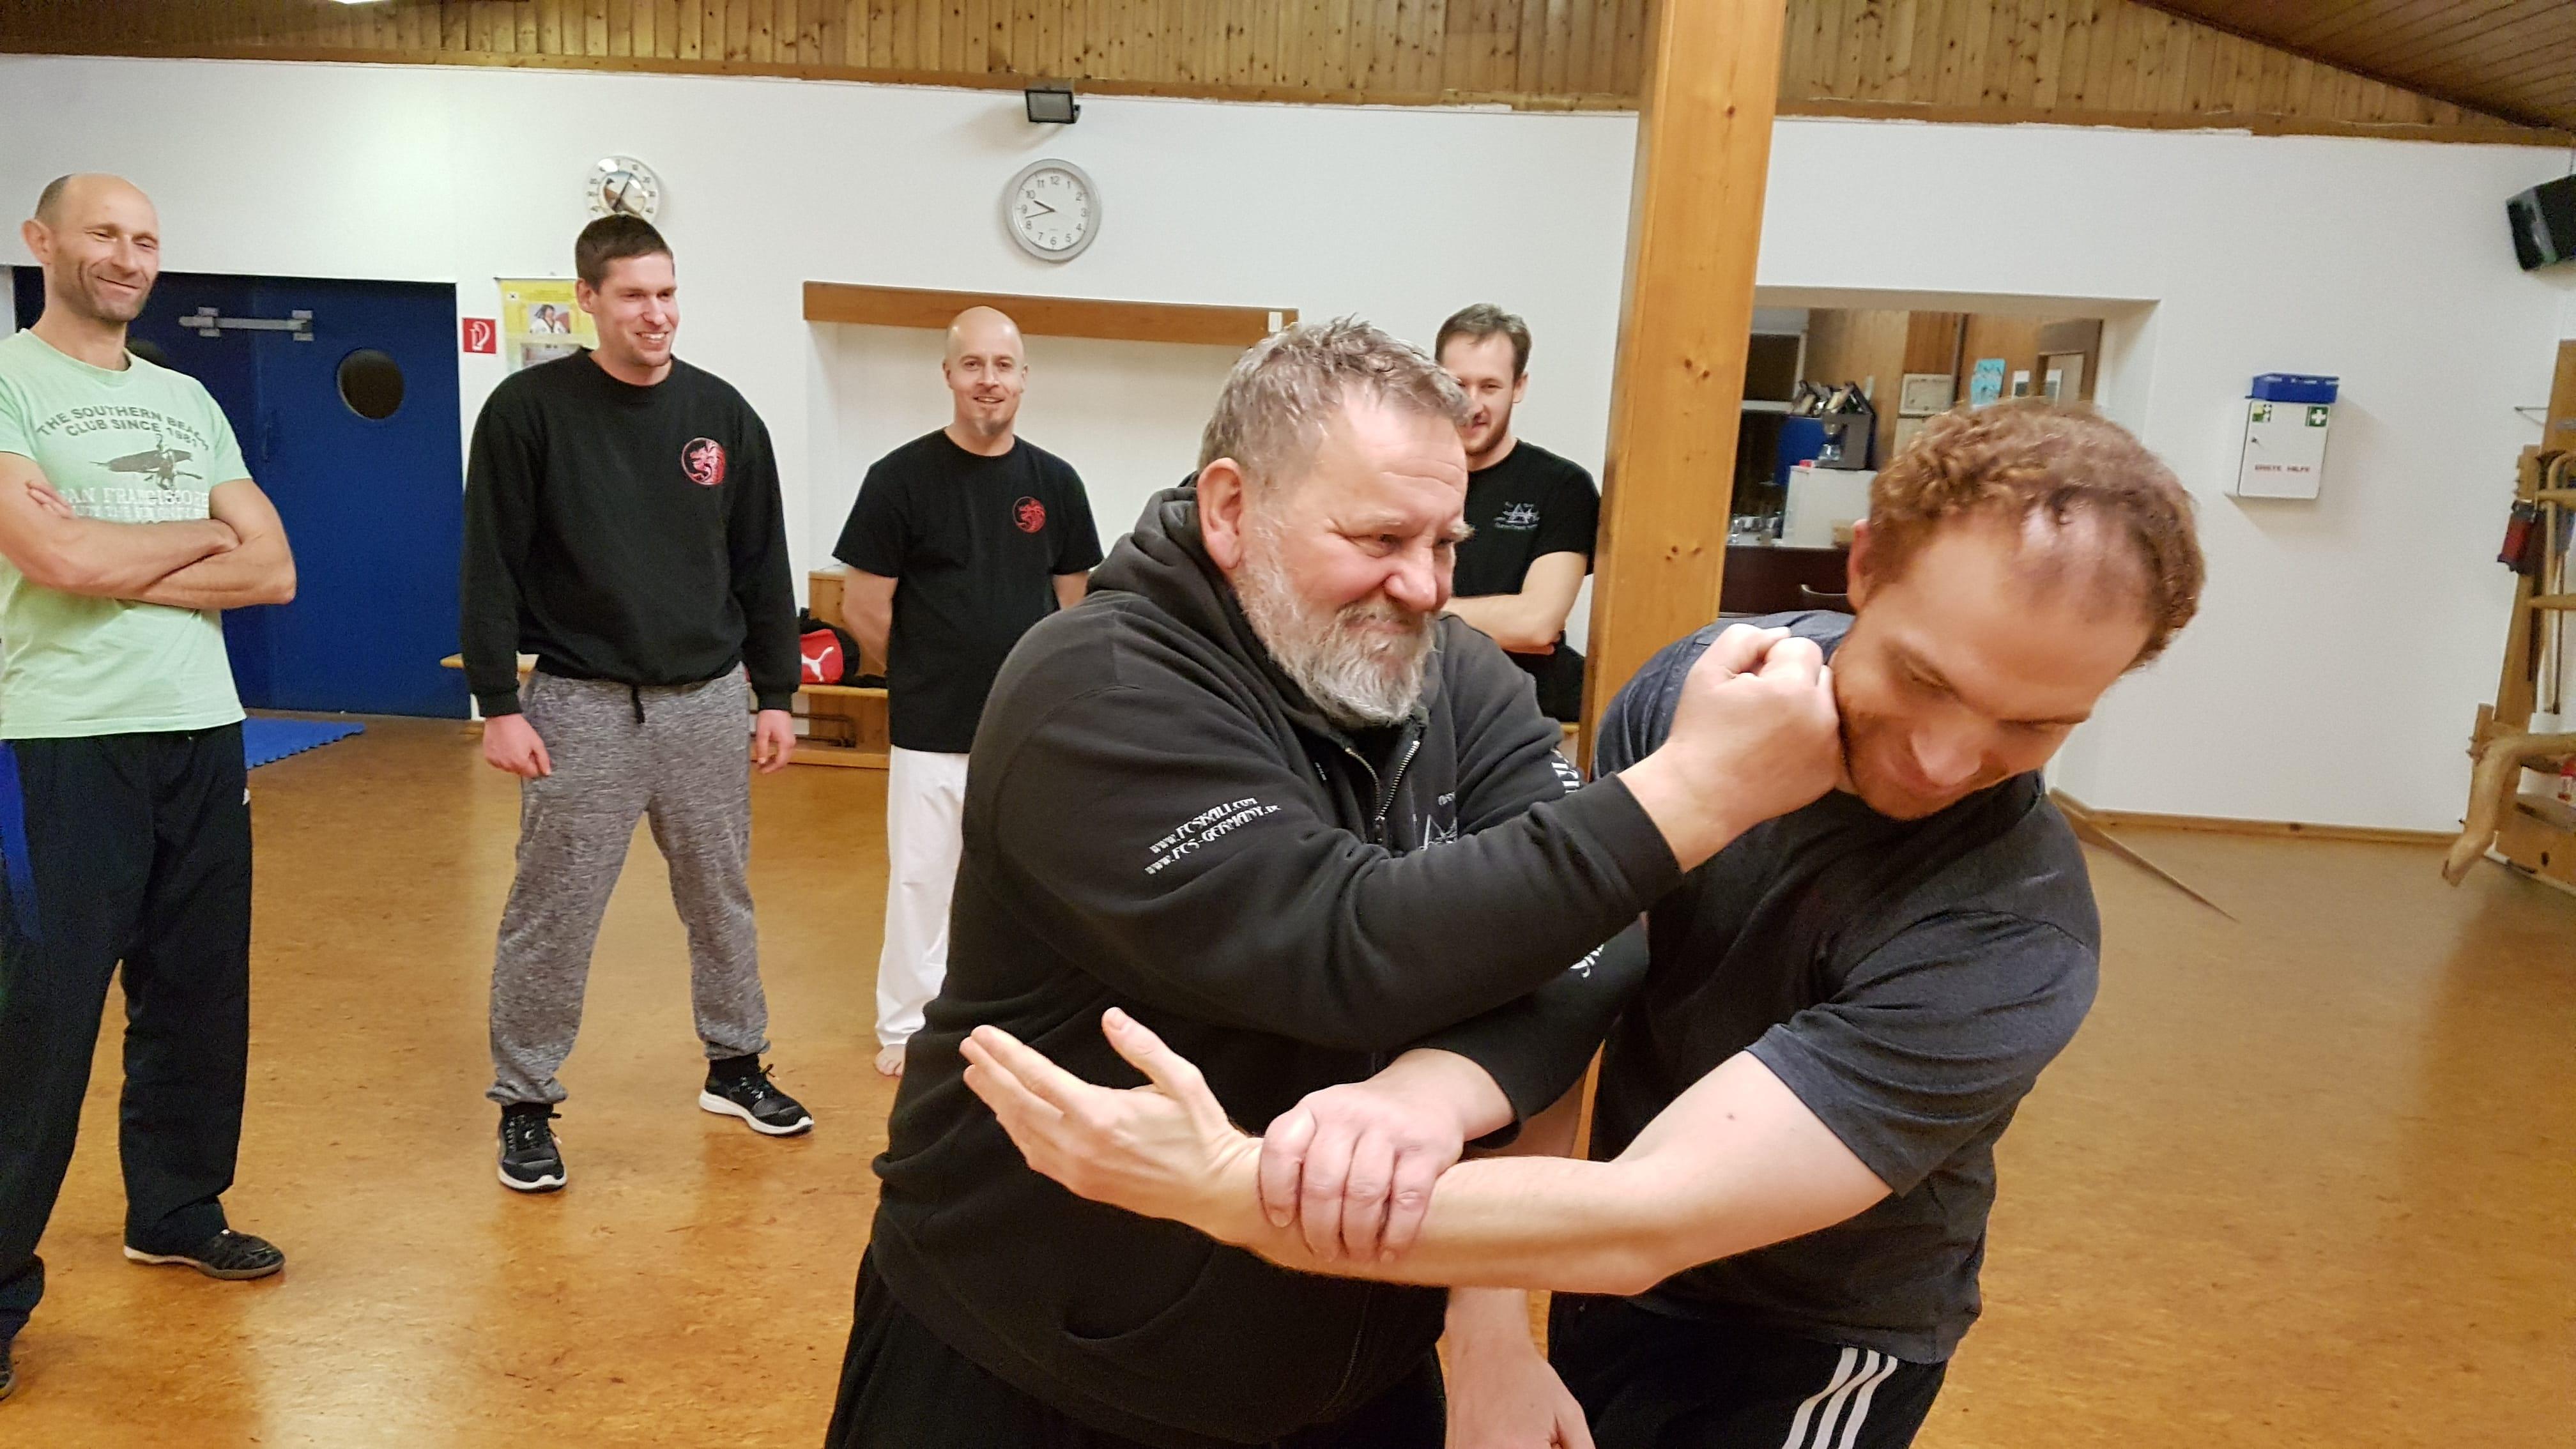 Kampfsport Selbstverteidigung Ansbach Kampfkunst